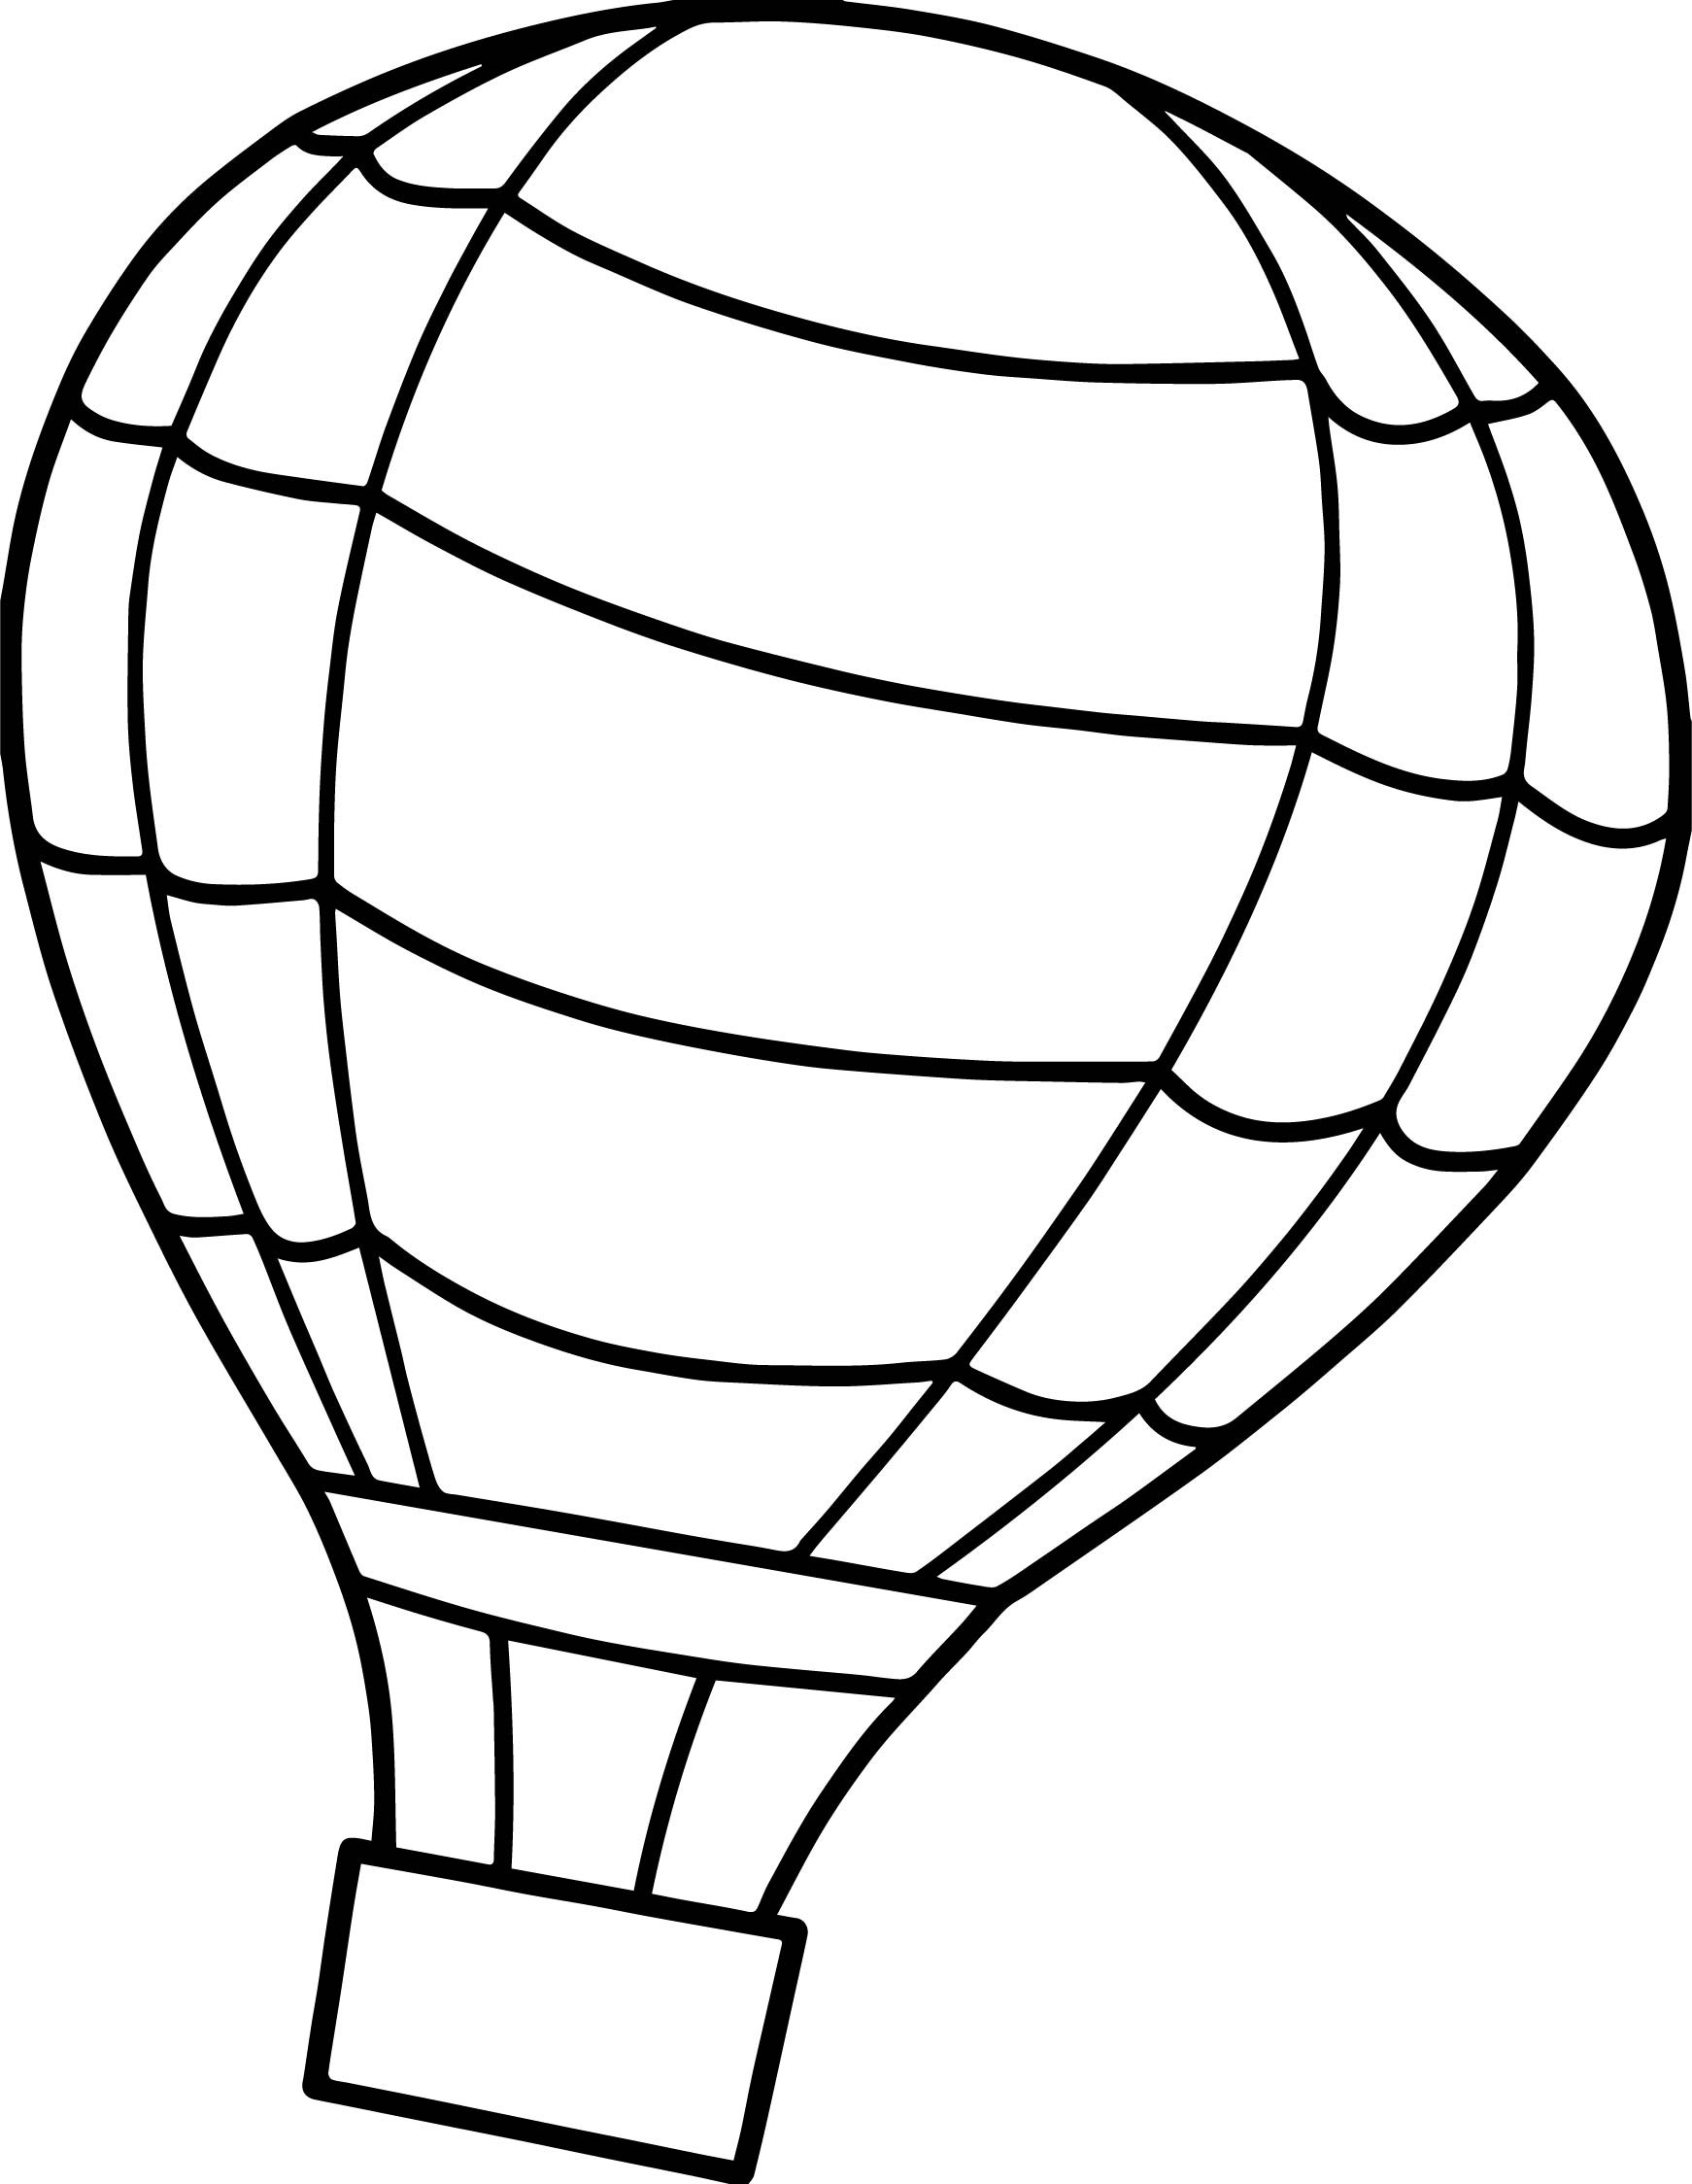 Free Coloring Sheets Of Balloons  Flip Air Balloon Coloring Page